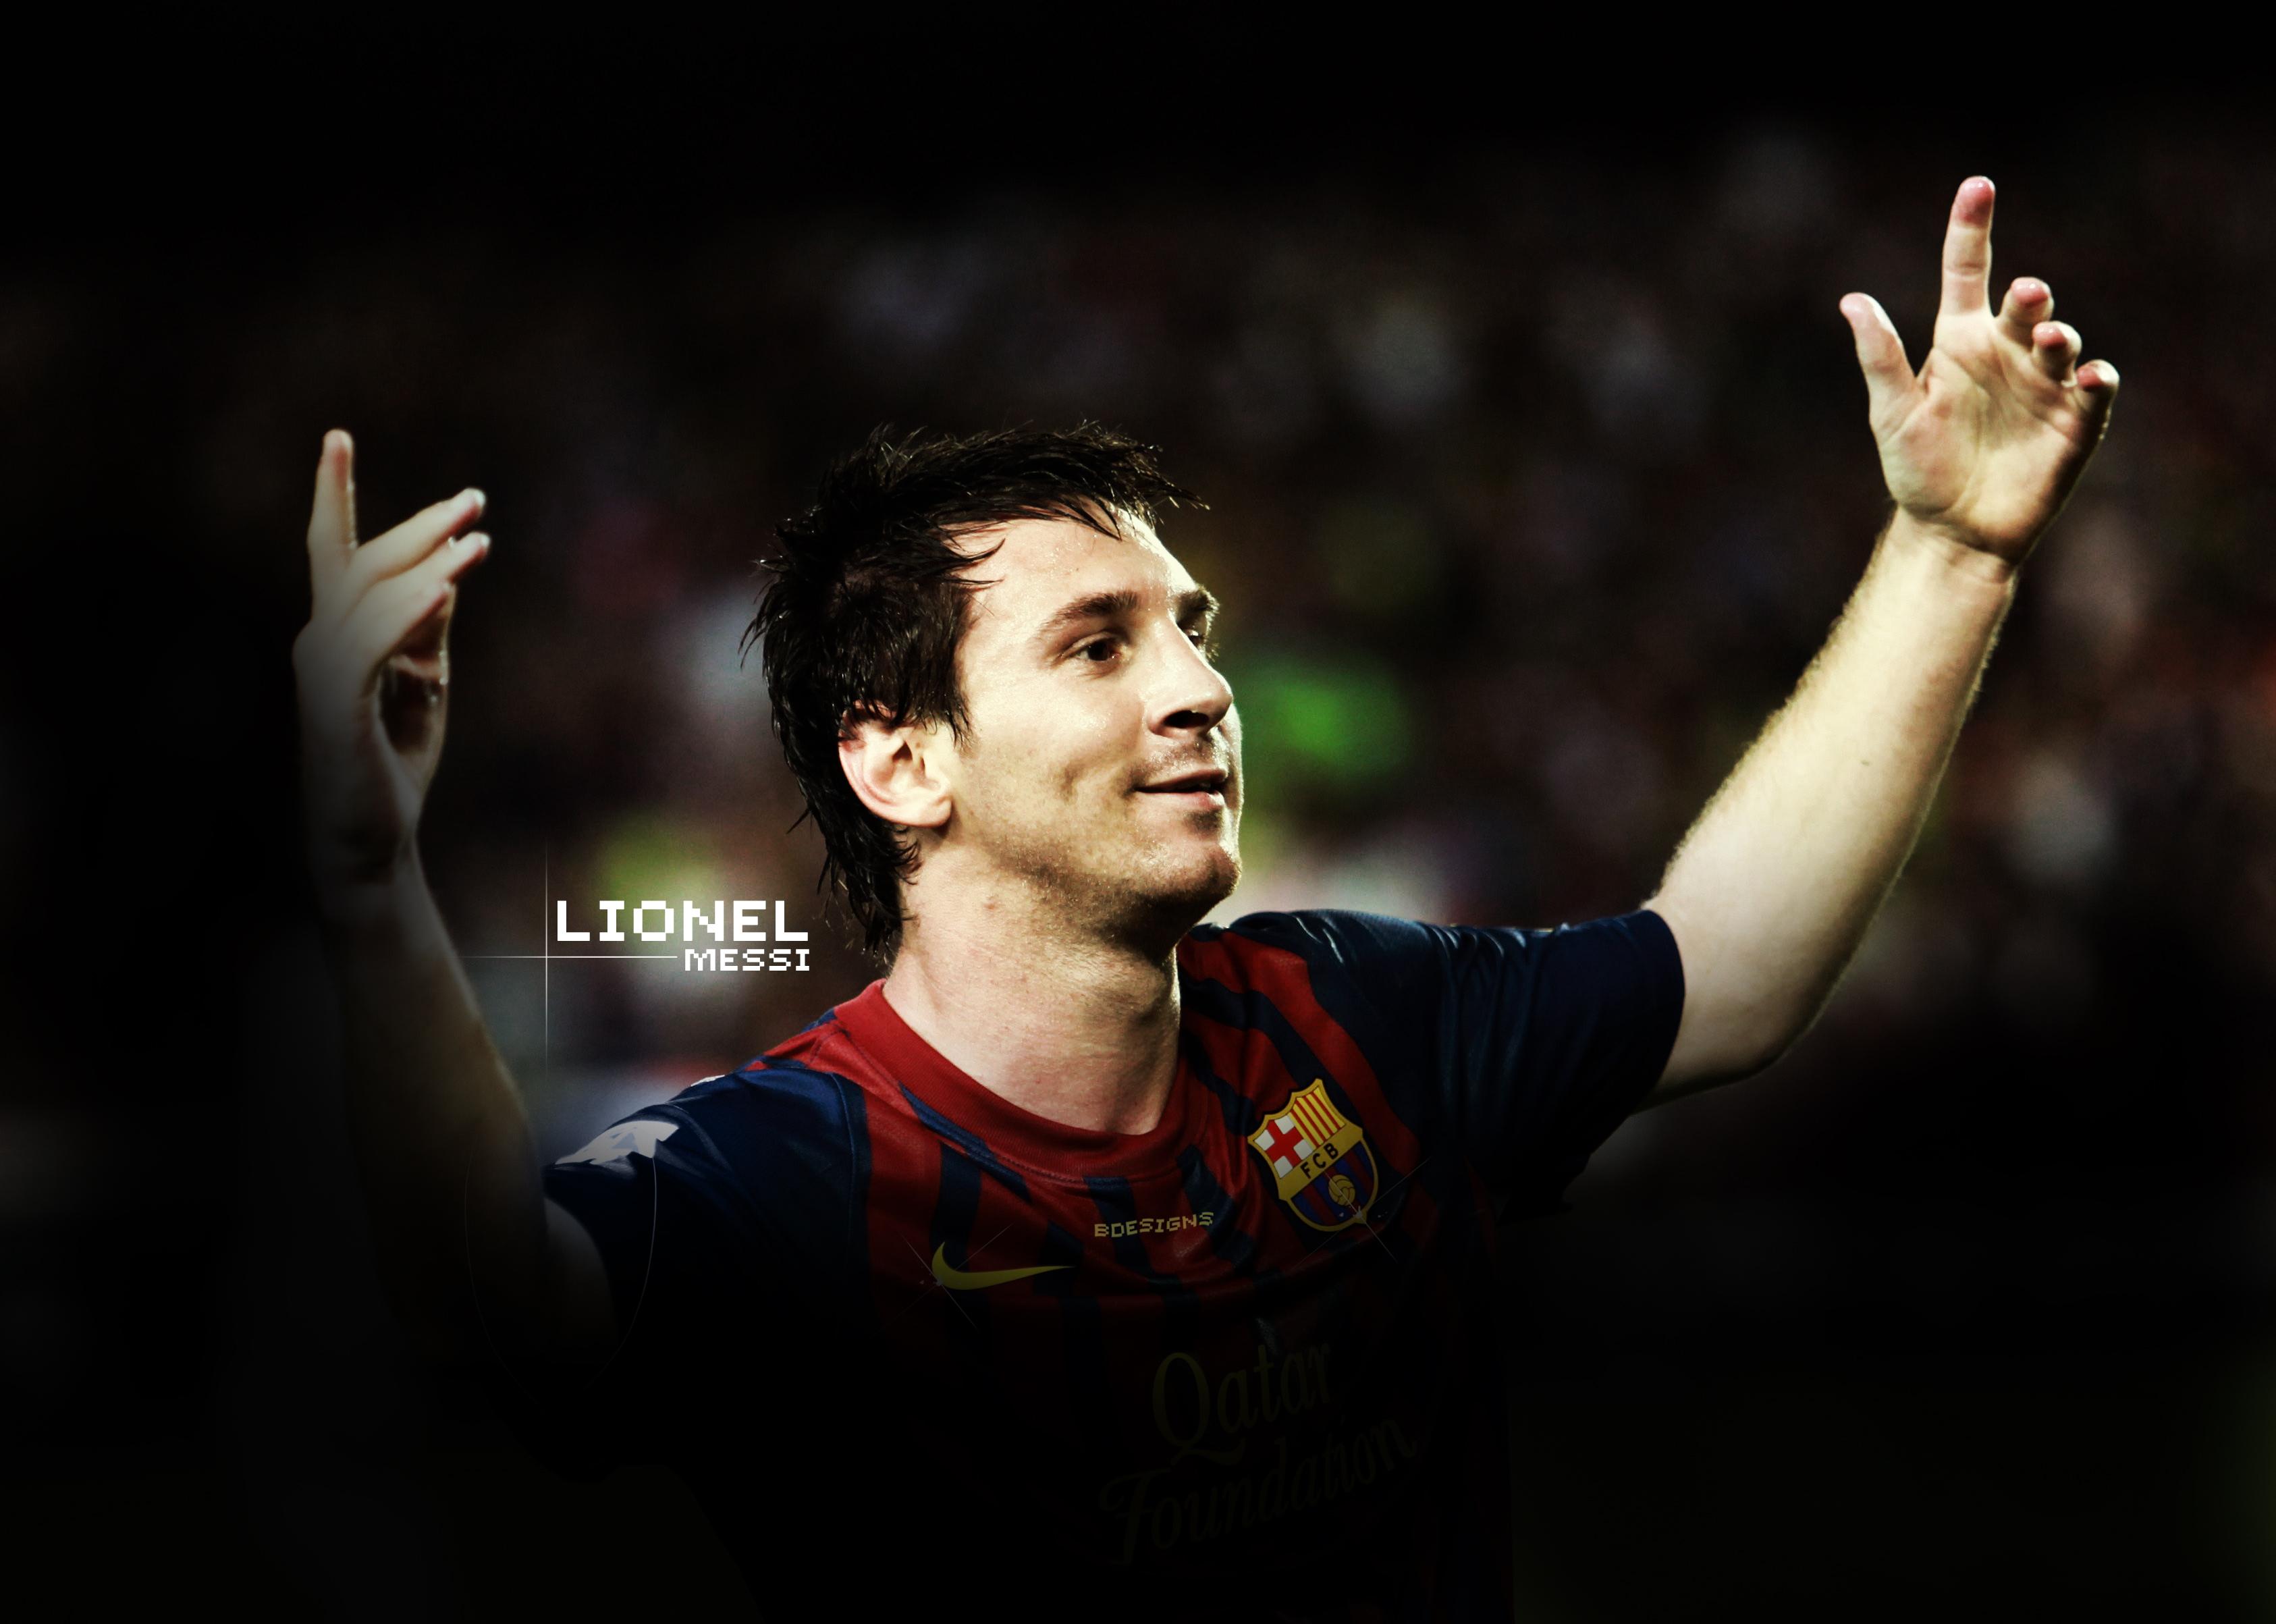 Free-Lionel-Messi-By-Kingofdesigndesign-On-DeviantArt-wallpaper-wp3805581